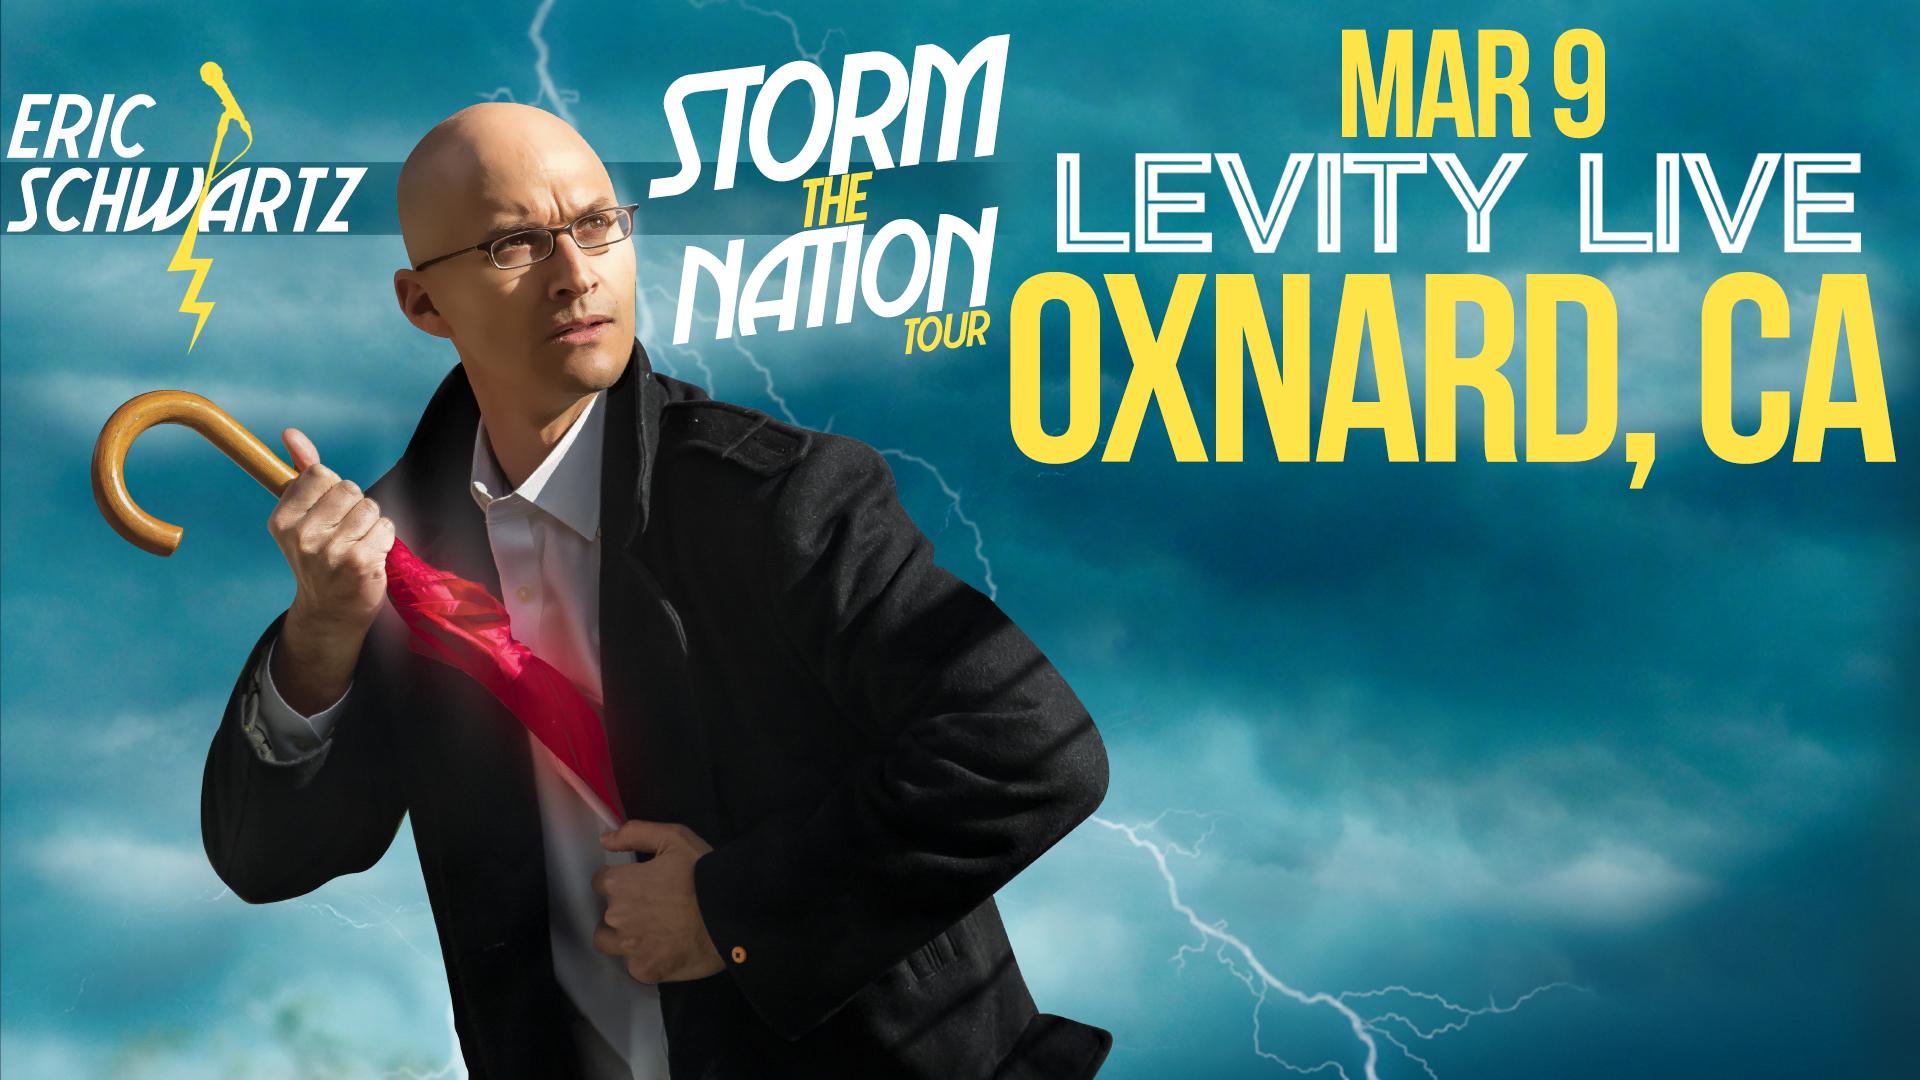 stormthenationfb-oxnard